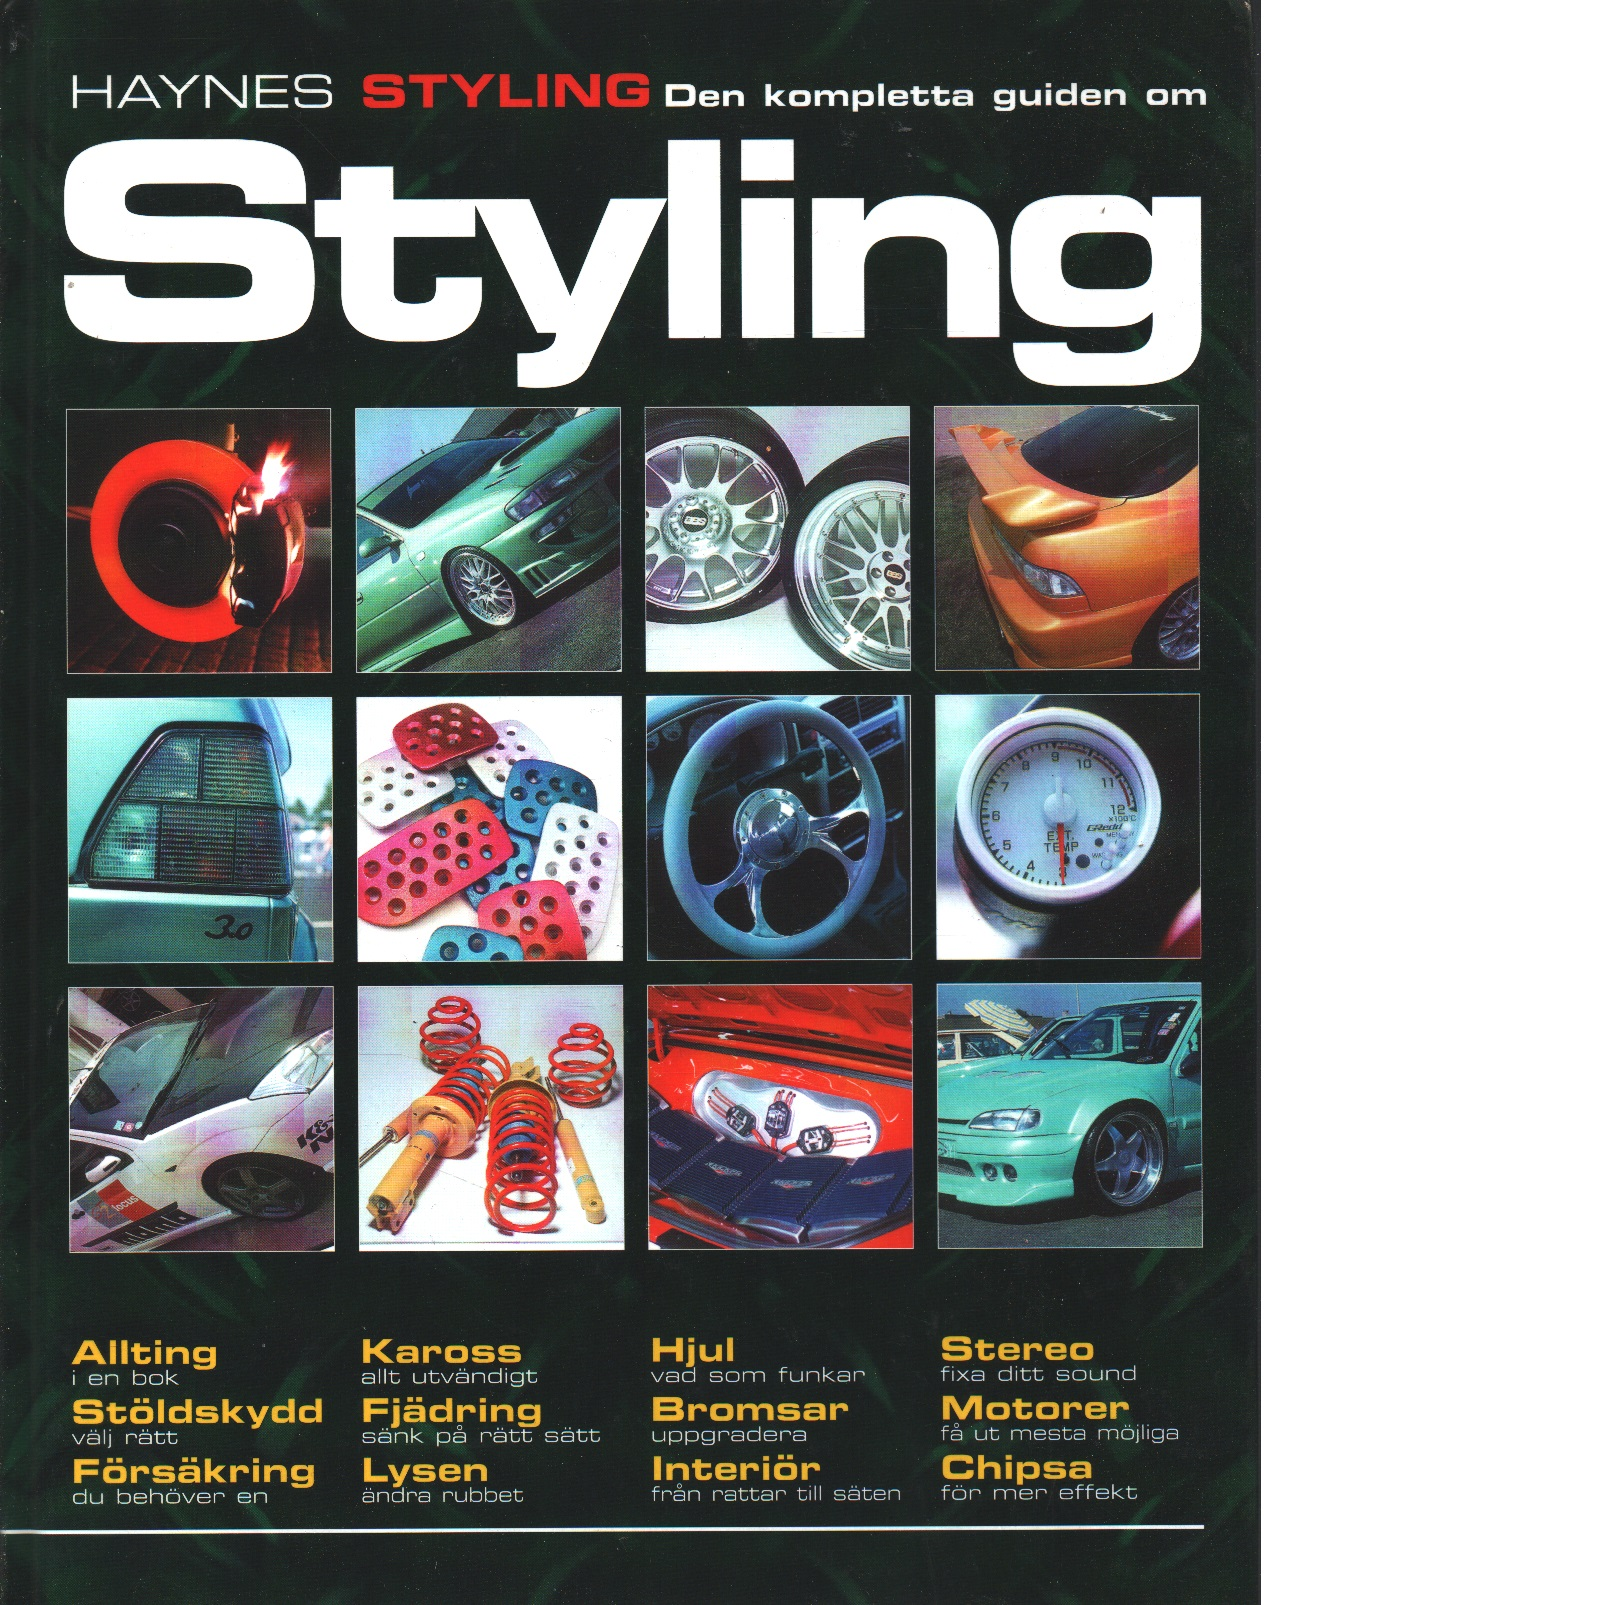 Den kompletta guiden om styling - Musselwhite, Bryn  och Jex, Robert M.